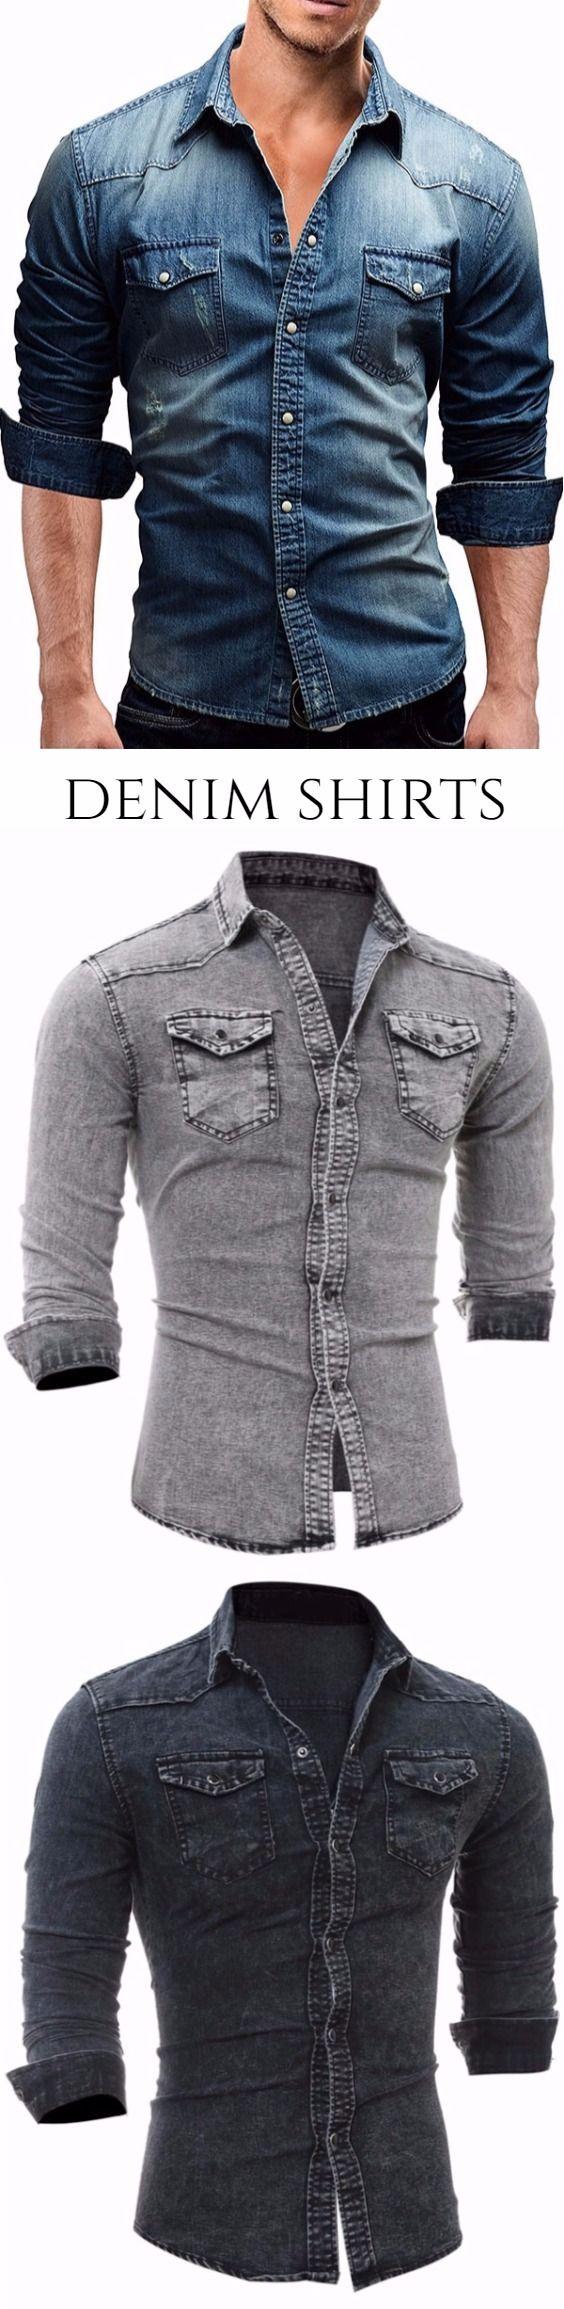 Flap Chest Pocket Long Sleeve Denim Shirt